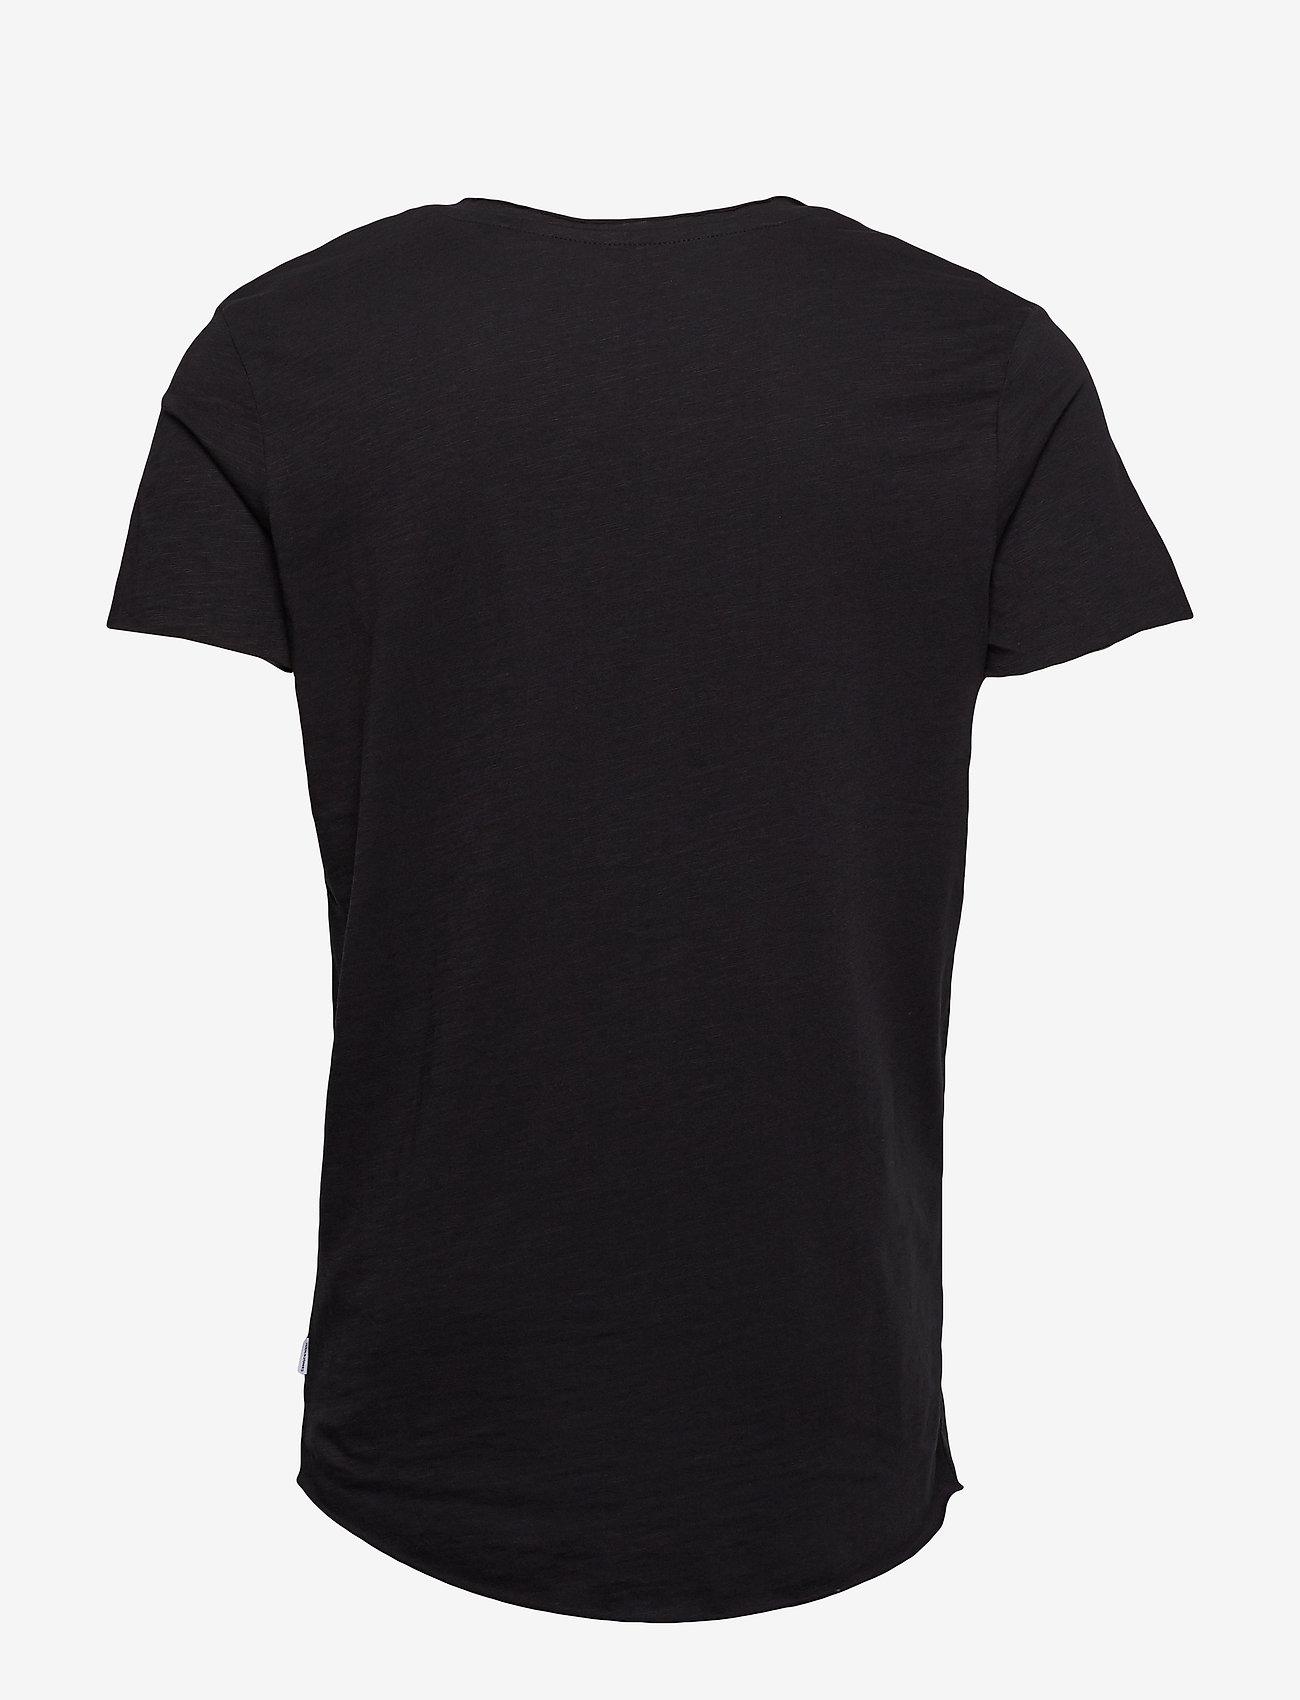 Jack & Jones - JJEBAS TEE SS U-NECK NOOS - basic t-shirts - black - 1